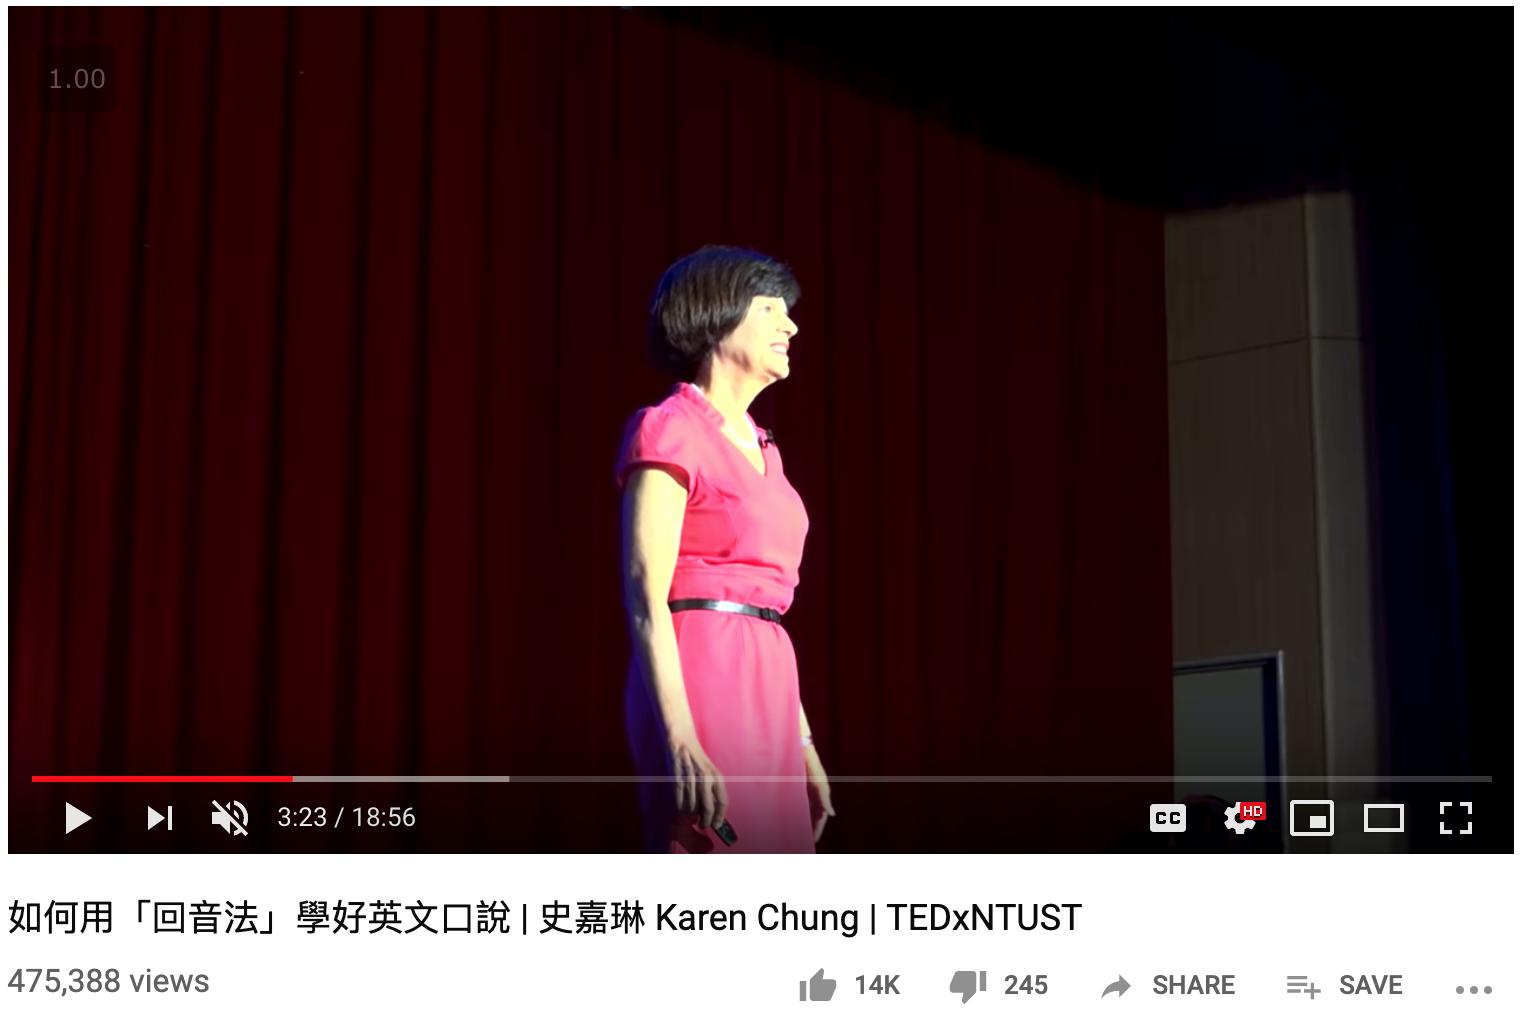 Karen Chung's TEDx Talk on The Echo Method